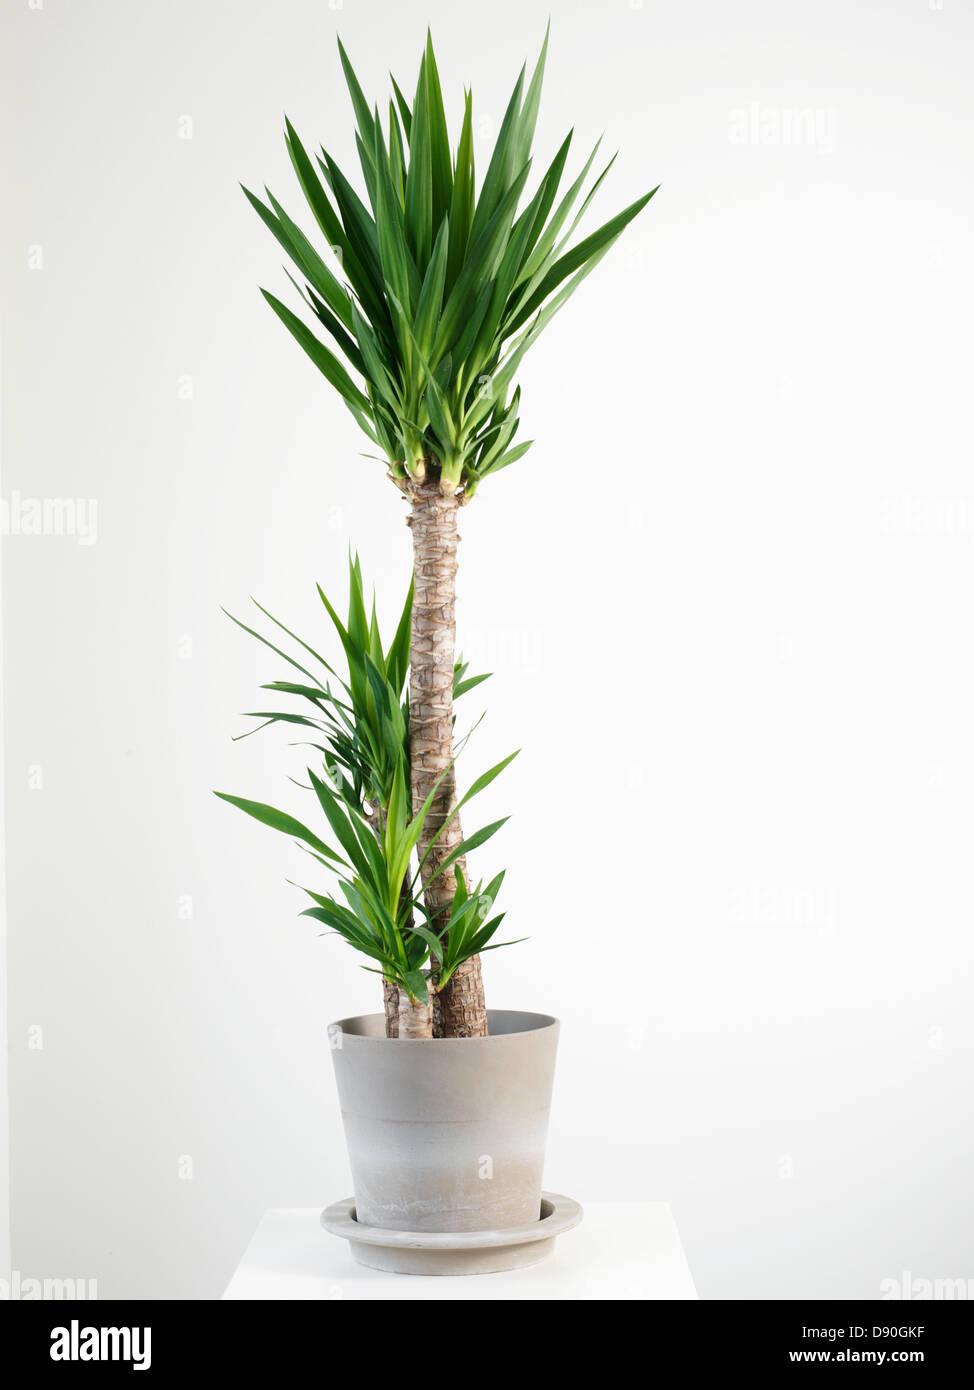 potted palm stockfotos potted palm bilder alamy. Black Bedroom Furniture Sets. Home Design Ideas